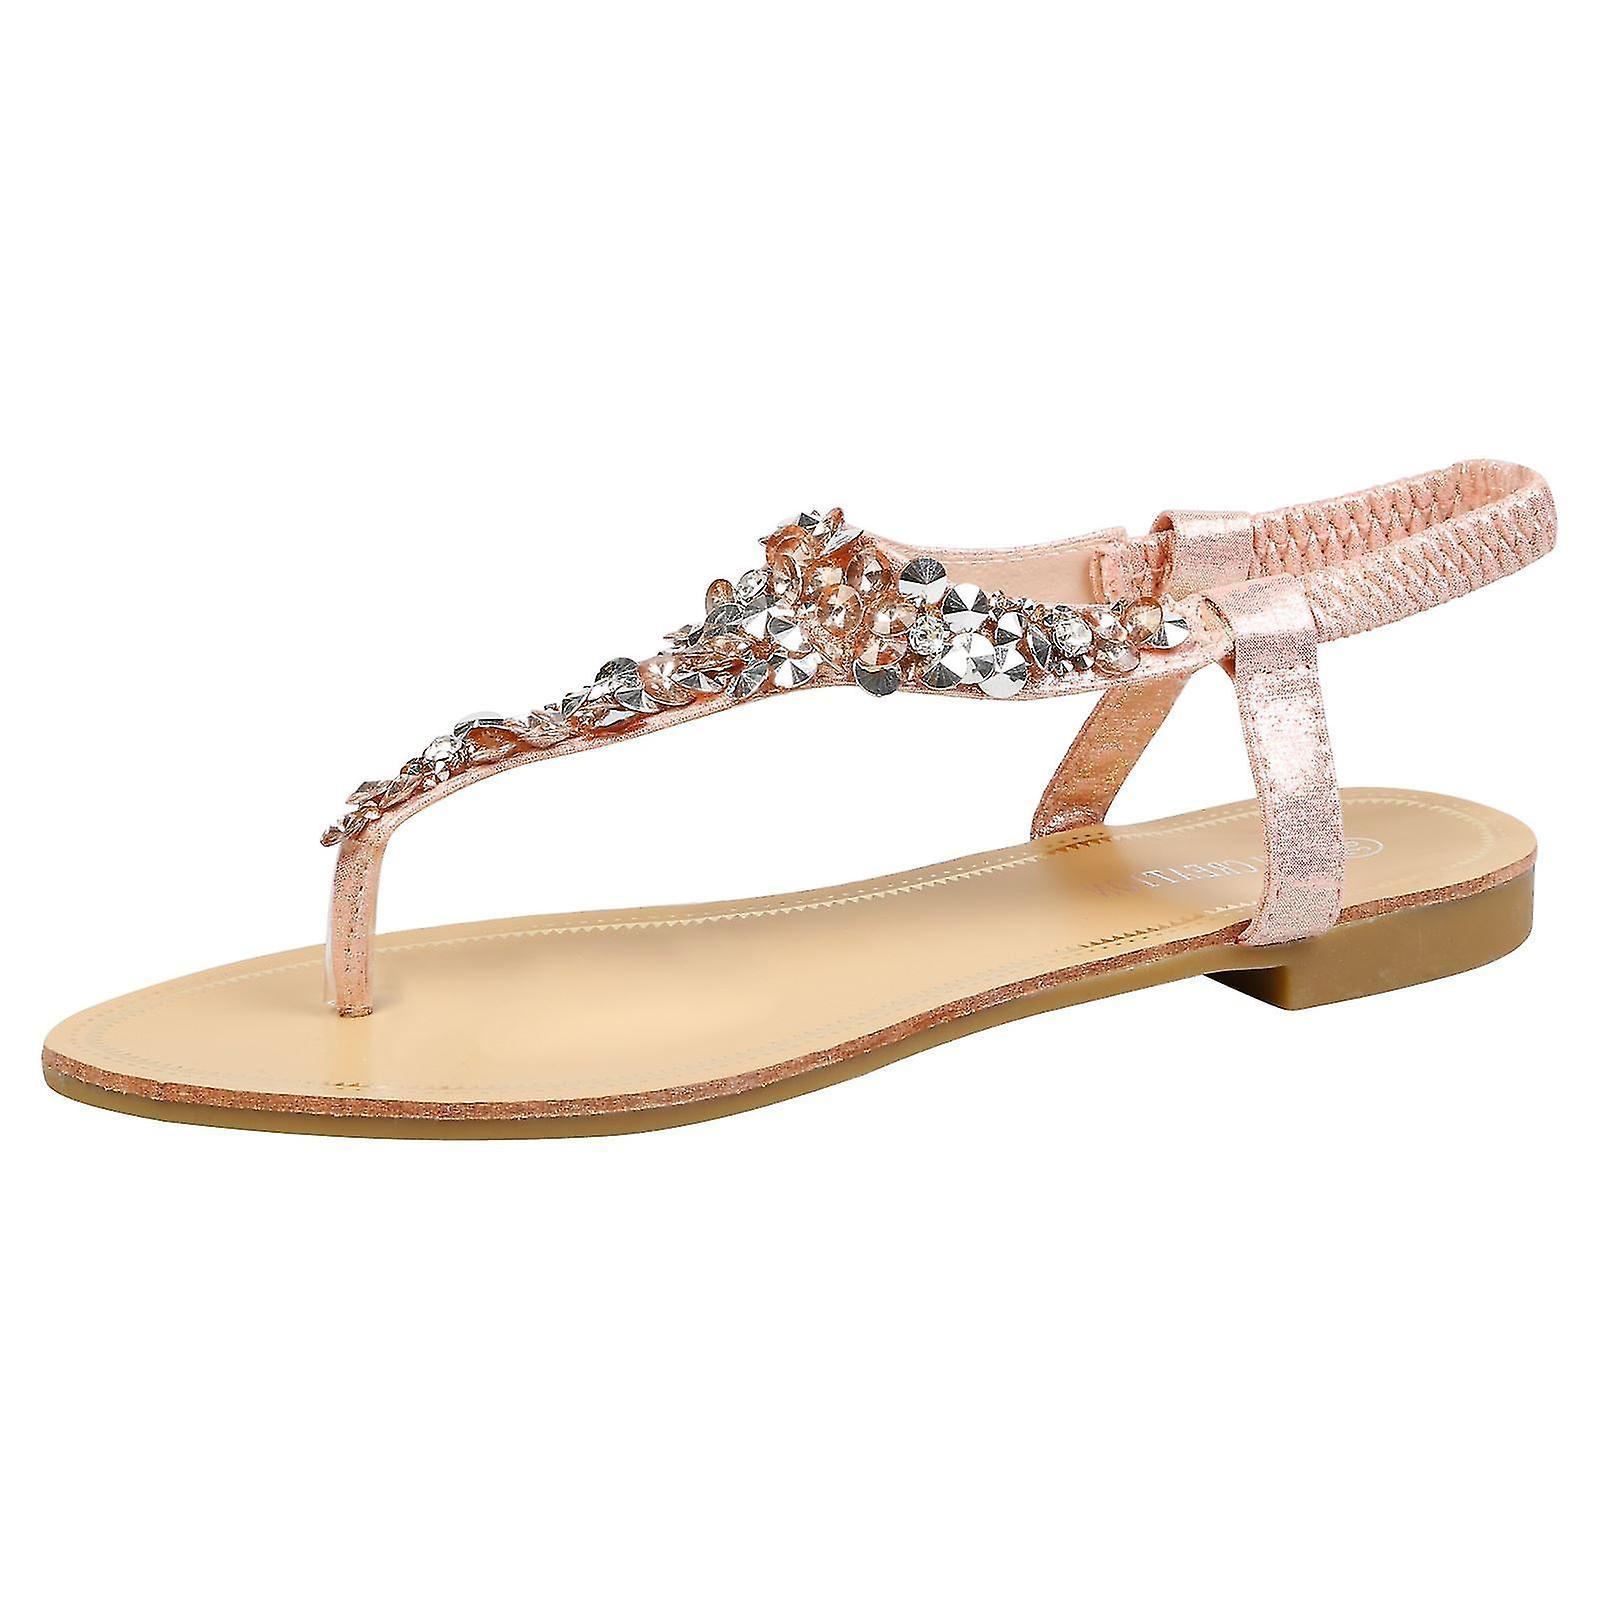 Veronica Womens Flats Diamante Elasticated Flip Flops Ladies Thong Sandals Shoes